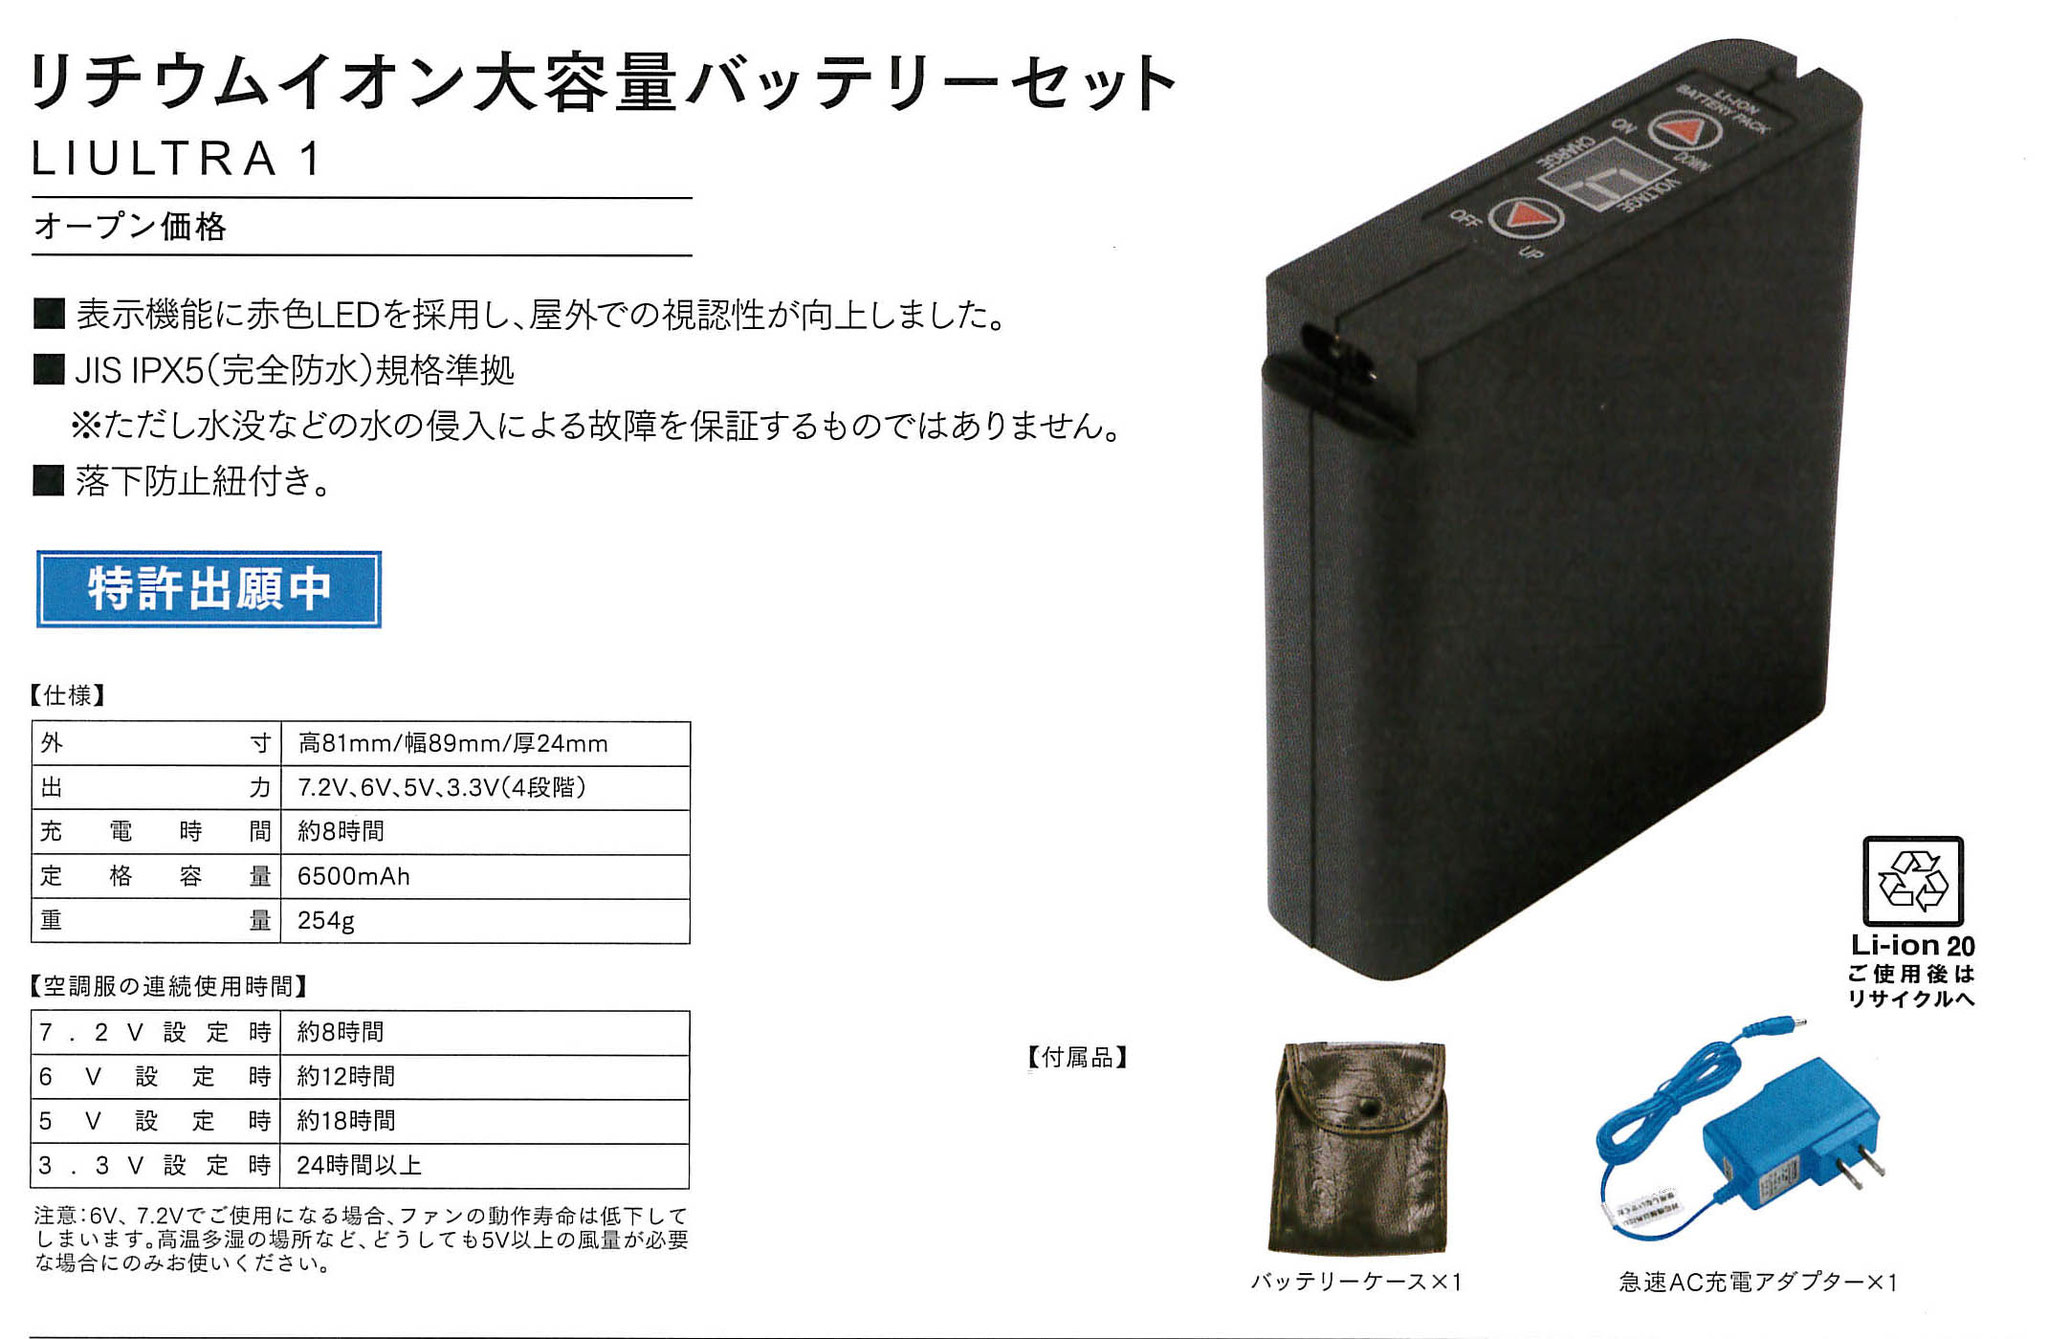 LIULTRA1J リチウムイオン大容量バッテリーセット ¥10,900(税込)